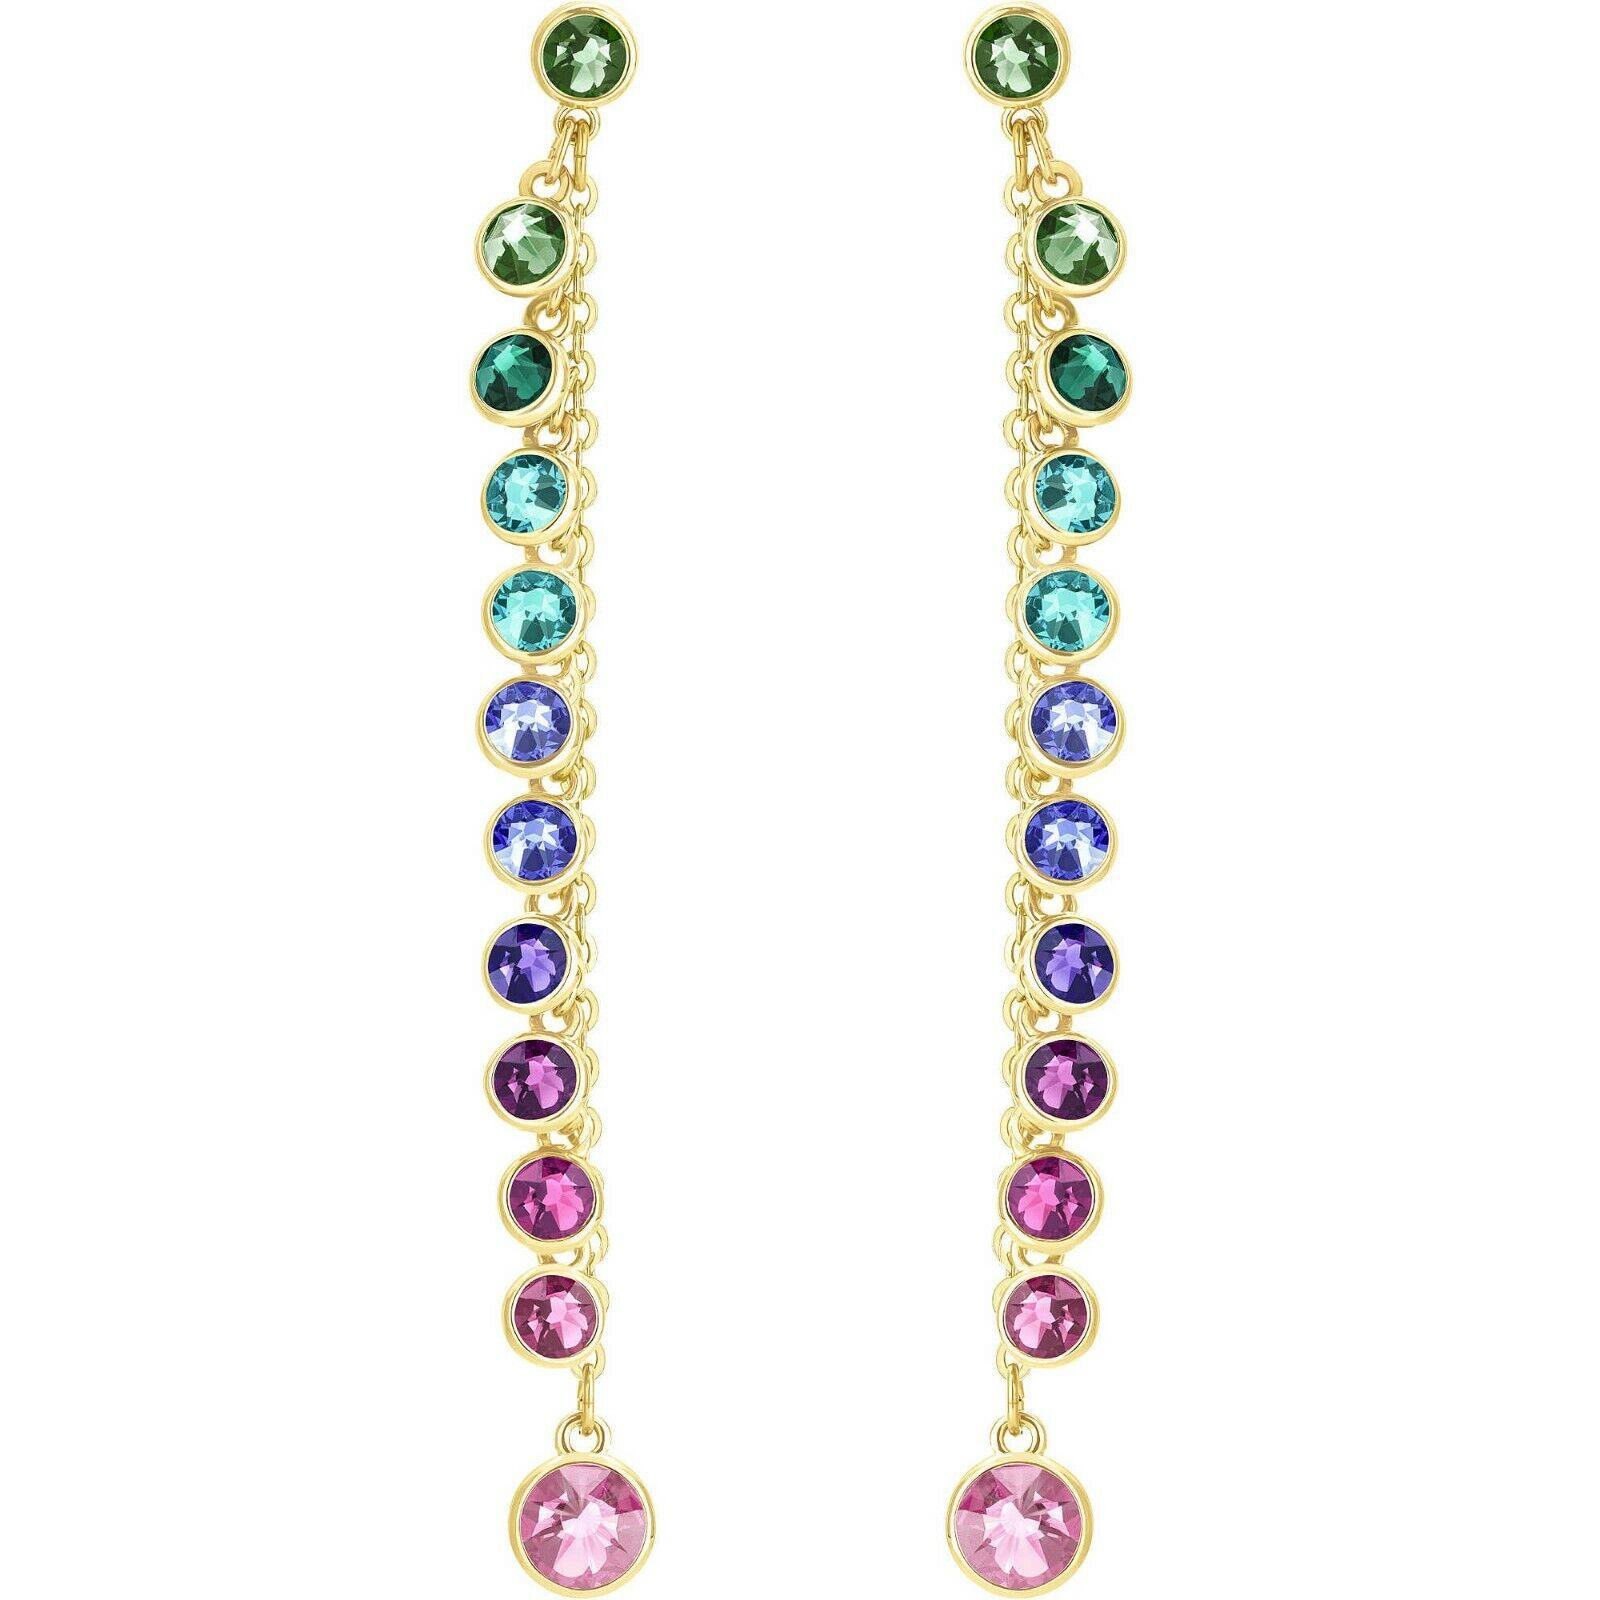 Swarovski Attract Pierced Earrings, Multi Coloured, gold Plating, 5402030